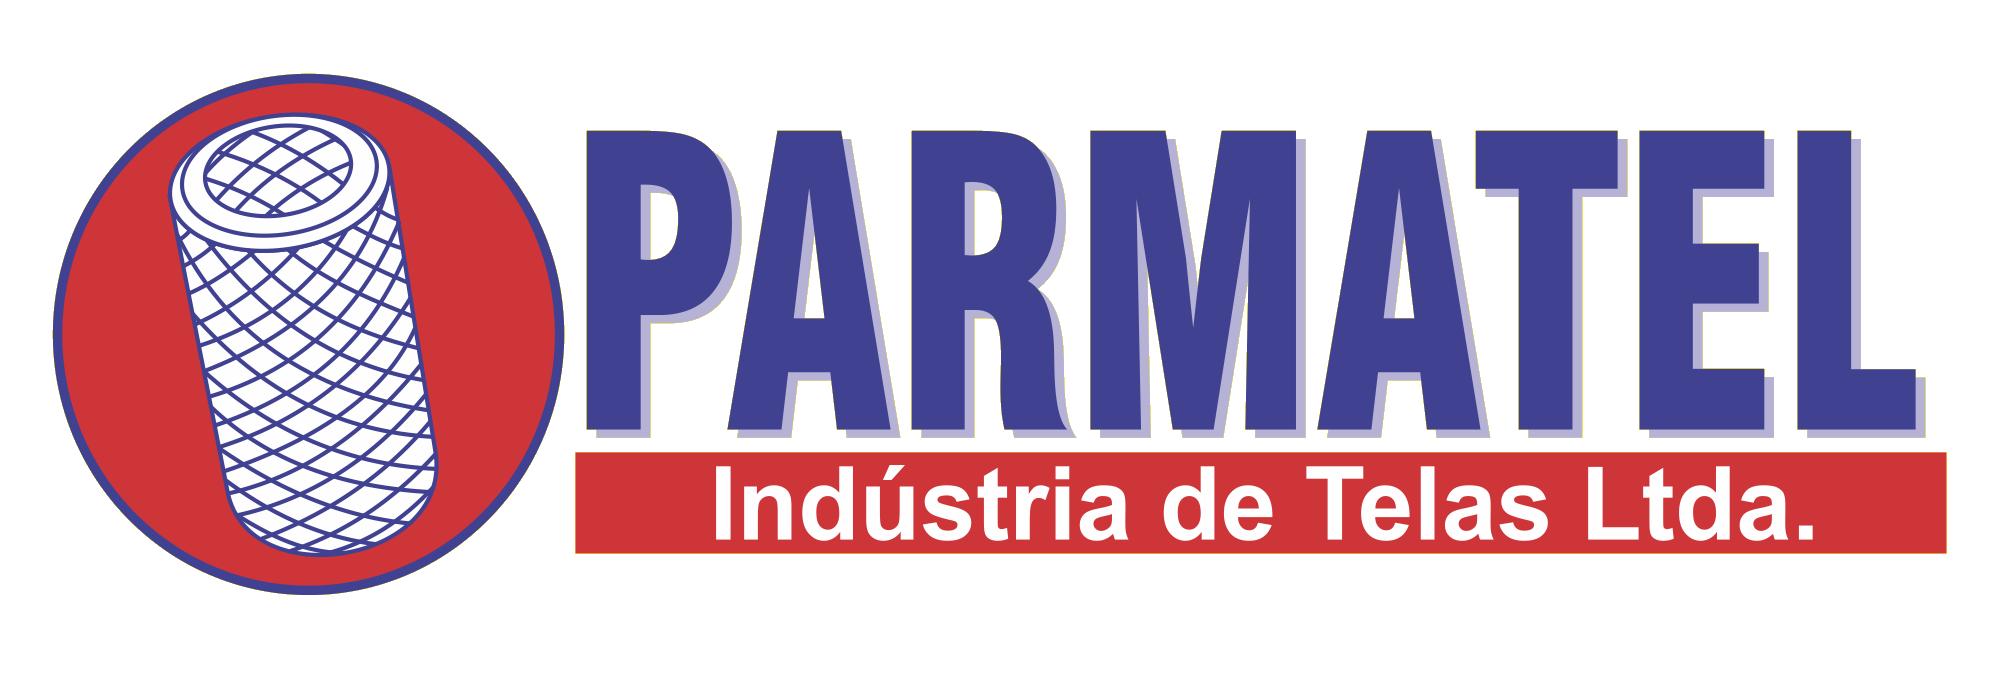 Parmatel